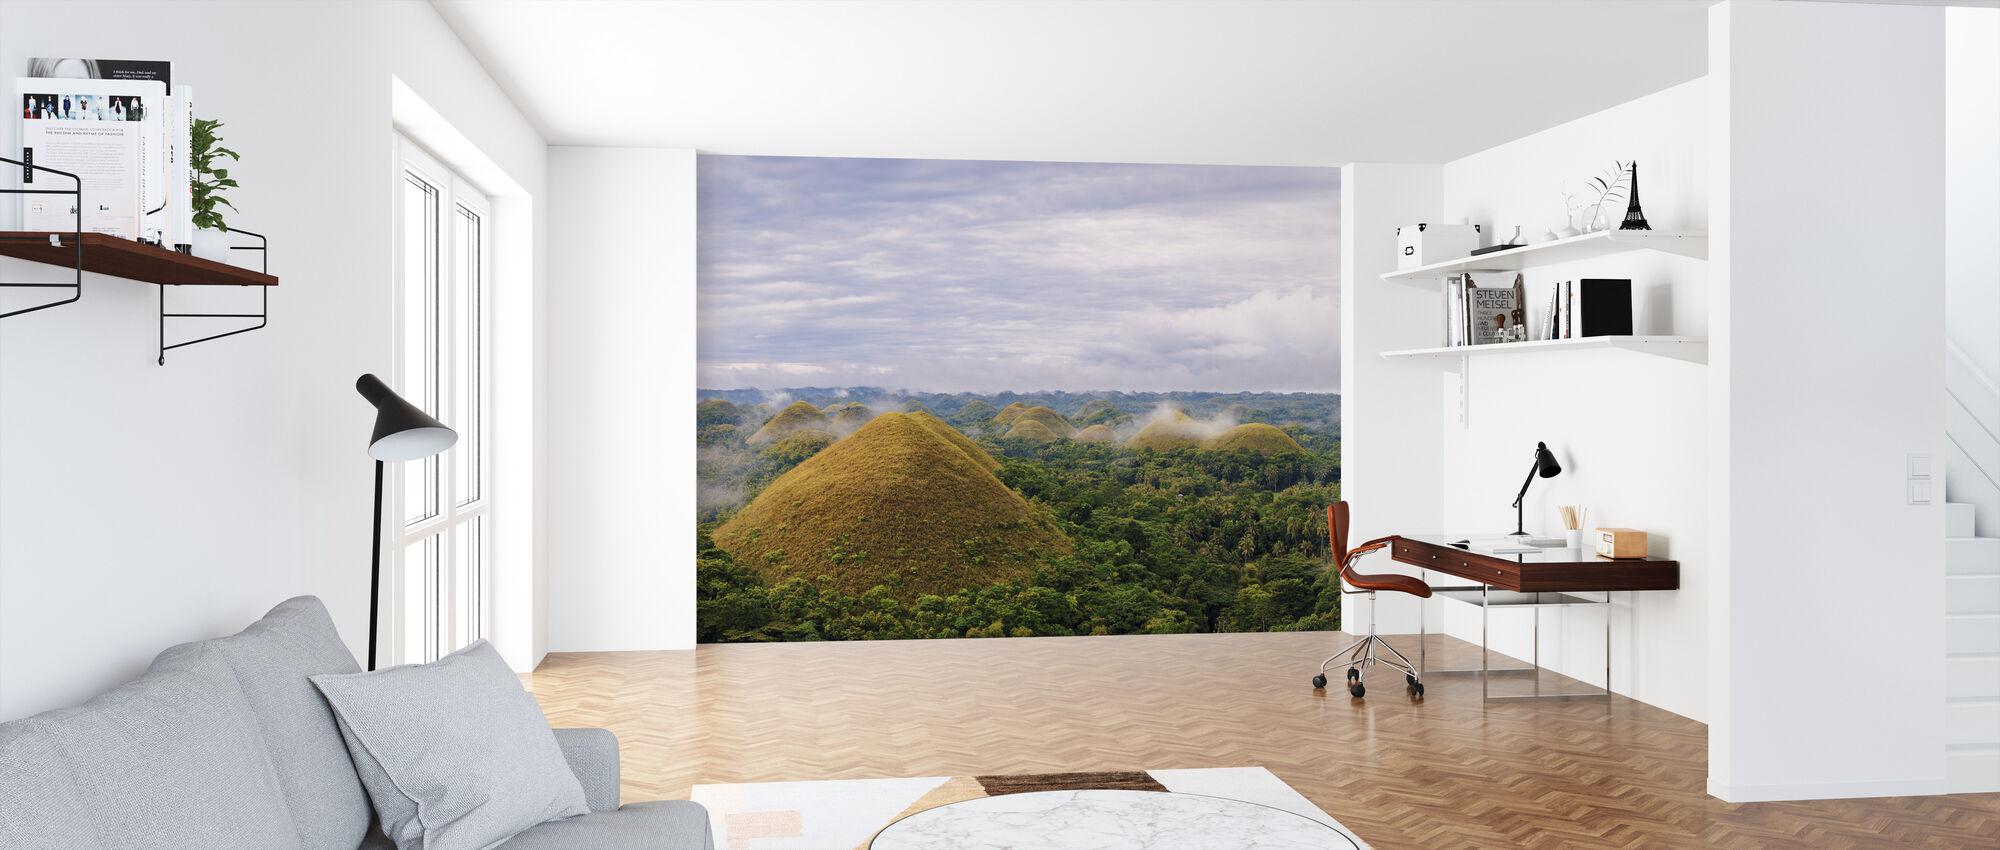 Chocolate hills, panoramic - Wallpaper - Office